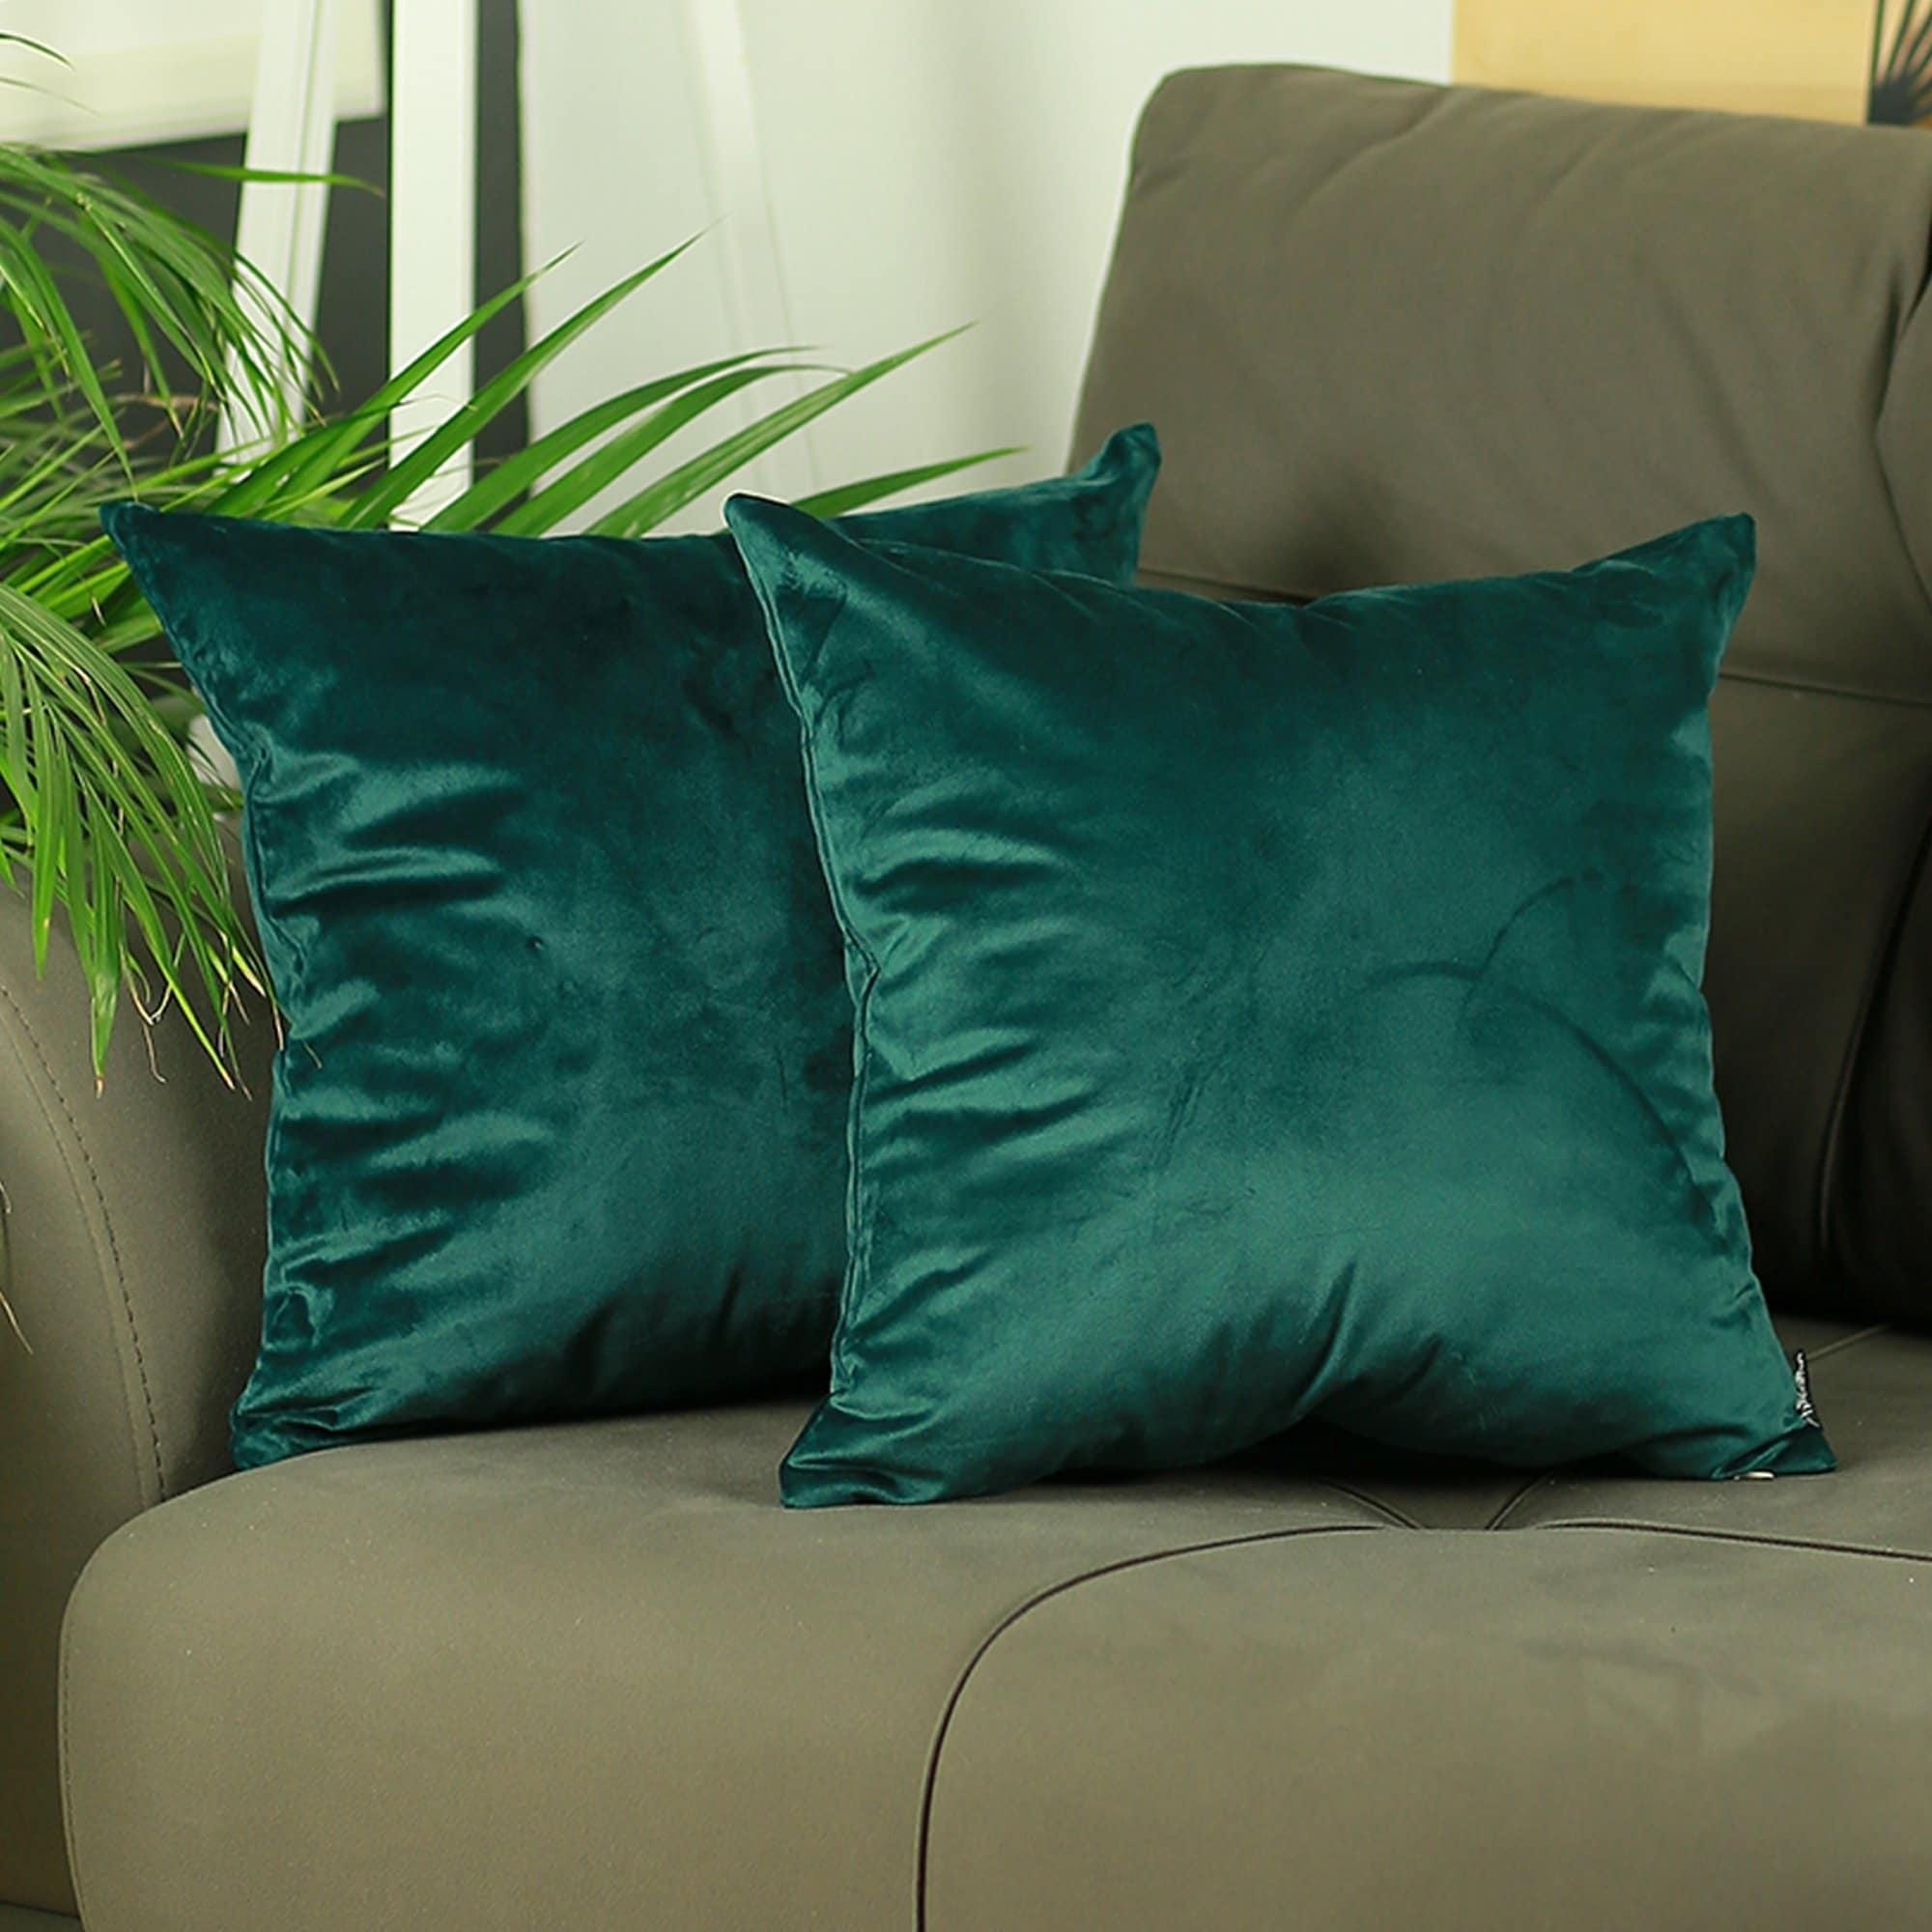 Silver Orchid Arco Velvet Dark Emerald Green Decorative Throw Pillow Overstock 28533541